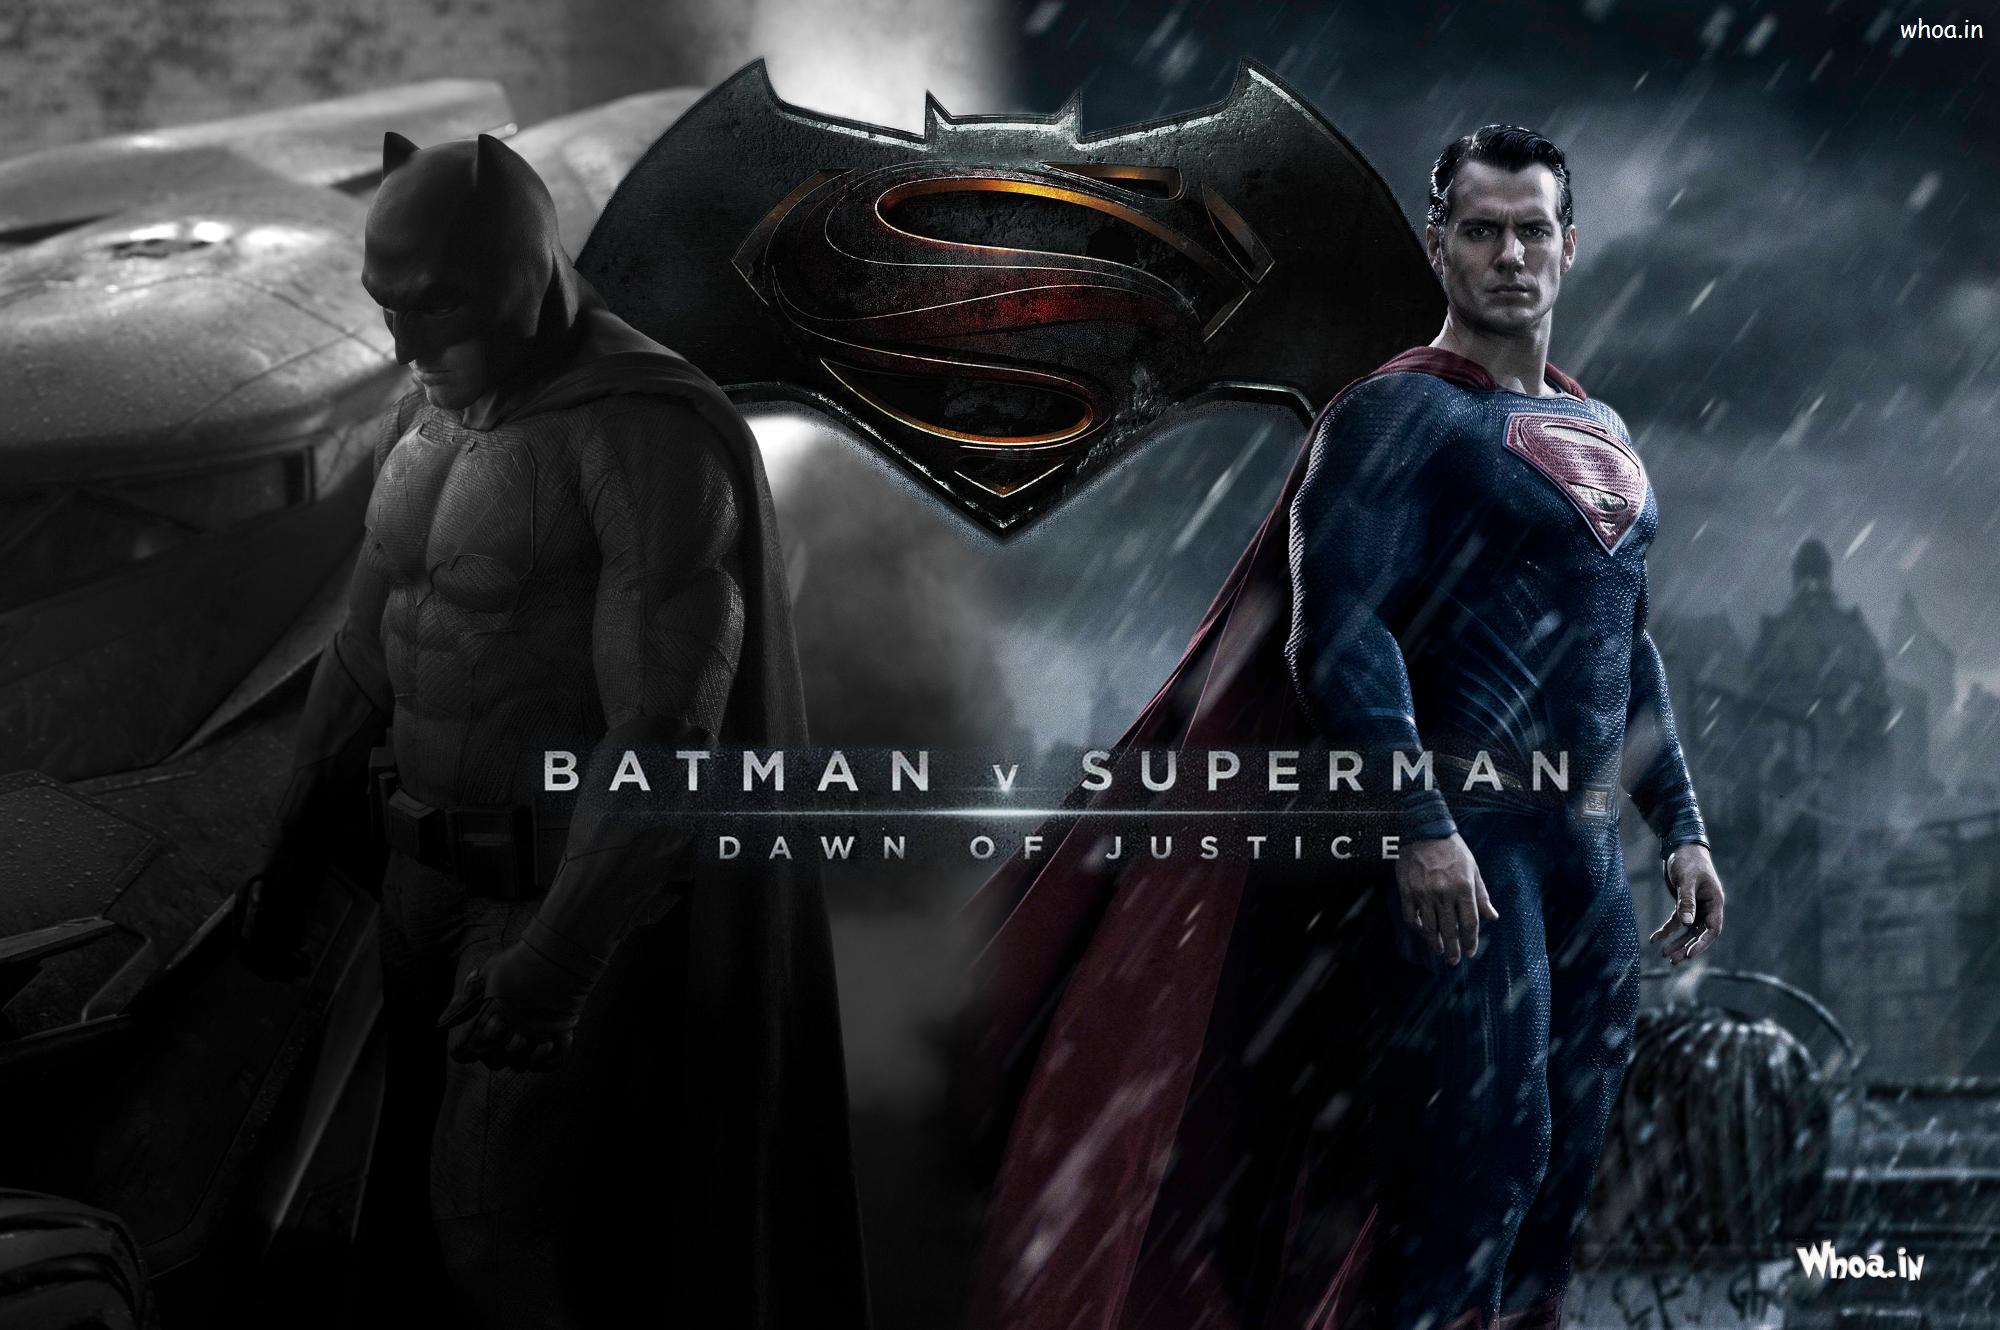 batman-v-superman-dawn-of-justice_trending-movies